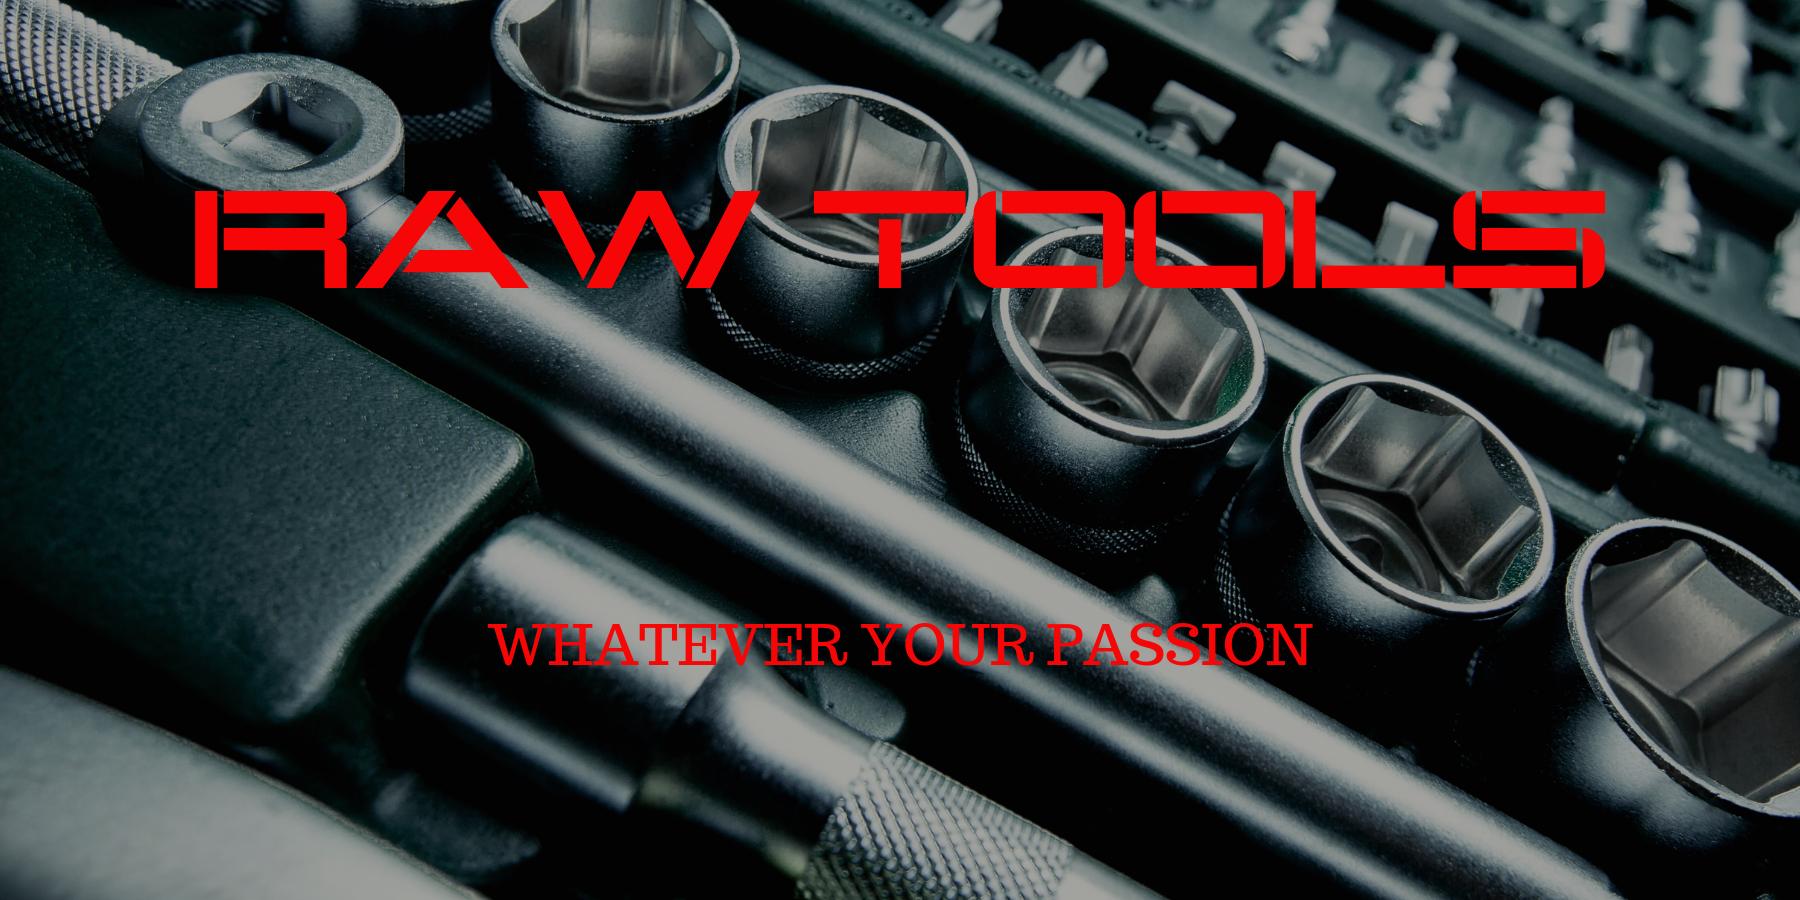 Raw Tools Australia home page